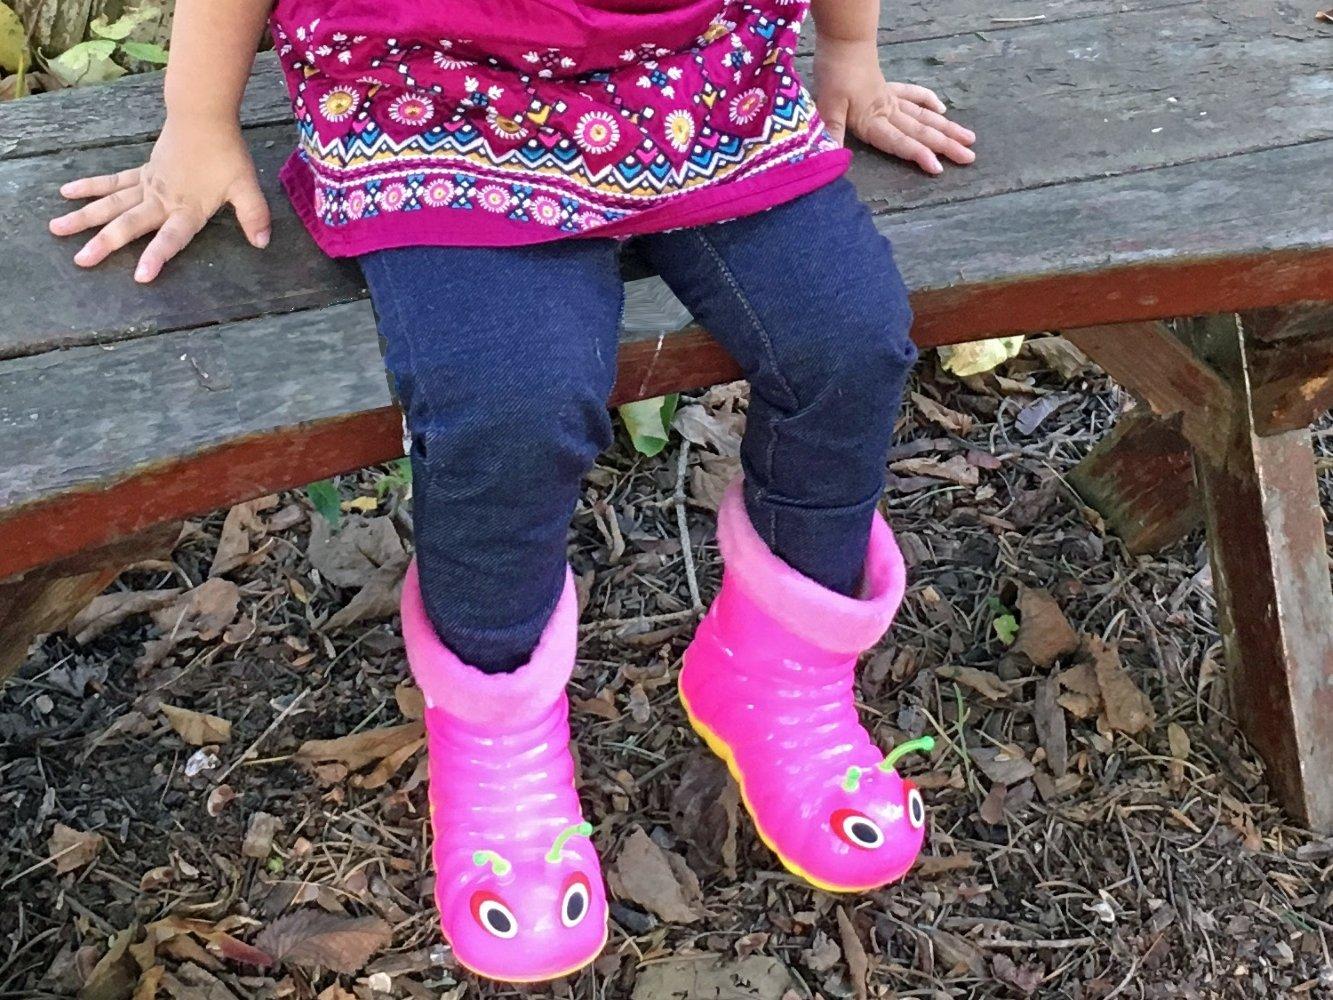 Children's Waterproof Rain Boots Cartoon Animals Toddler/Little Kid (28 (10 M US Toddler), Pink) by Beastie Shoes (Image #6)